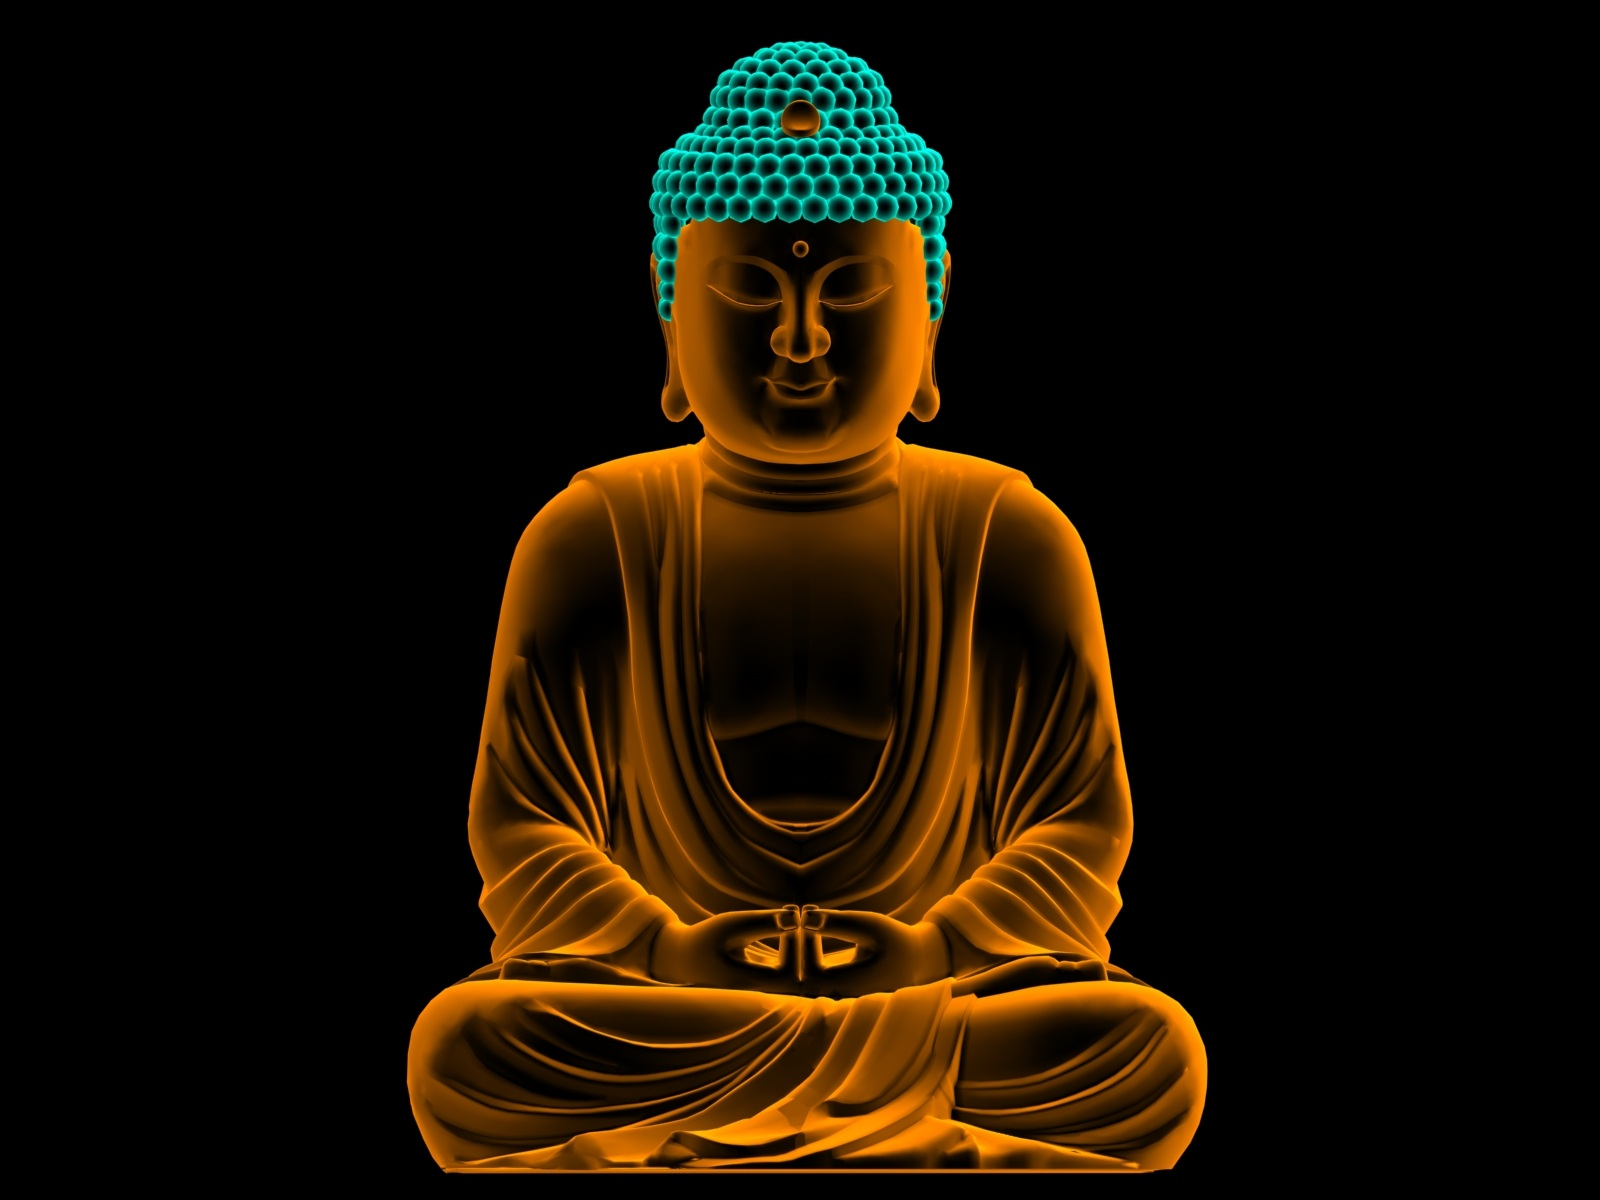 Lord Buddha HD Wallpapers ~ God wallpaper hd